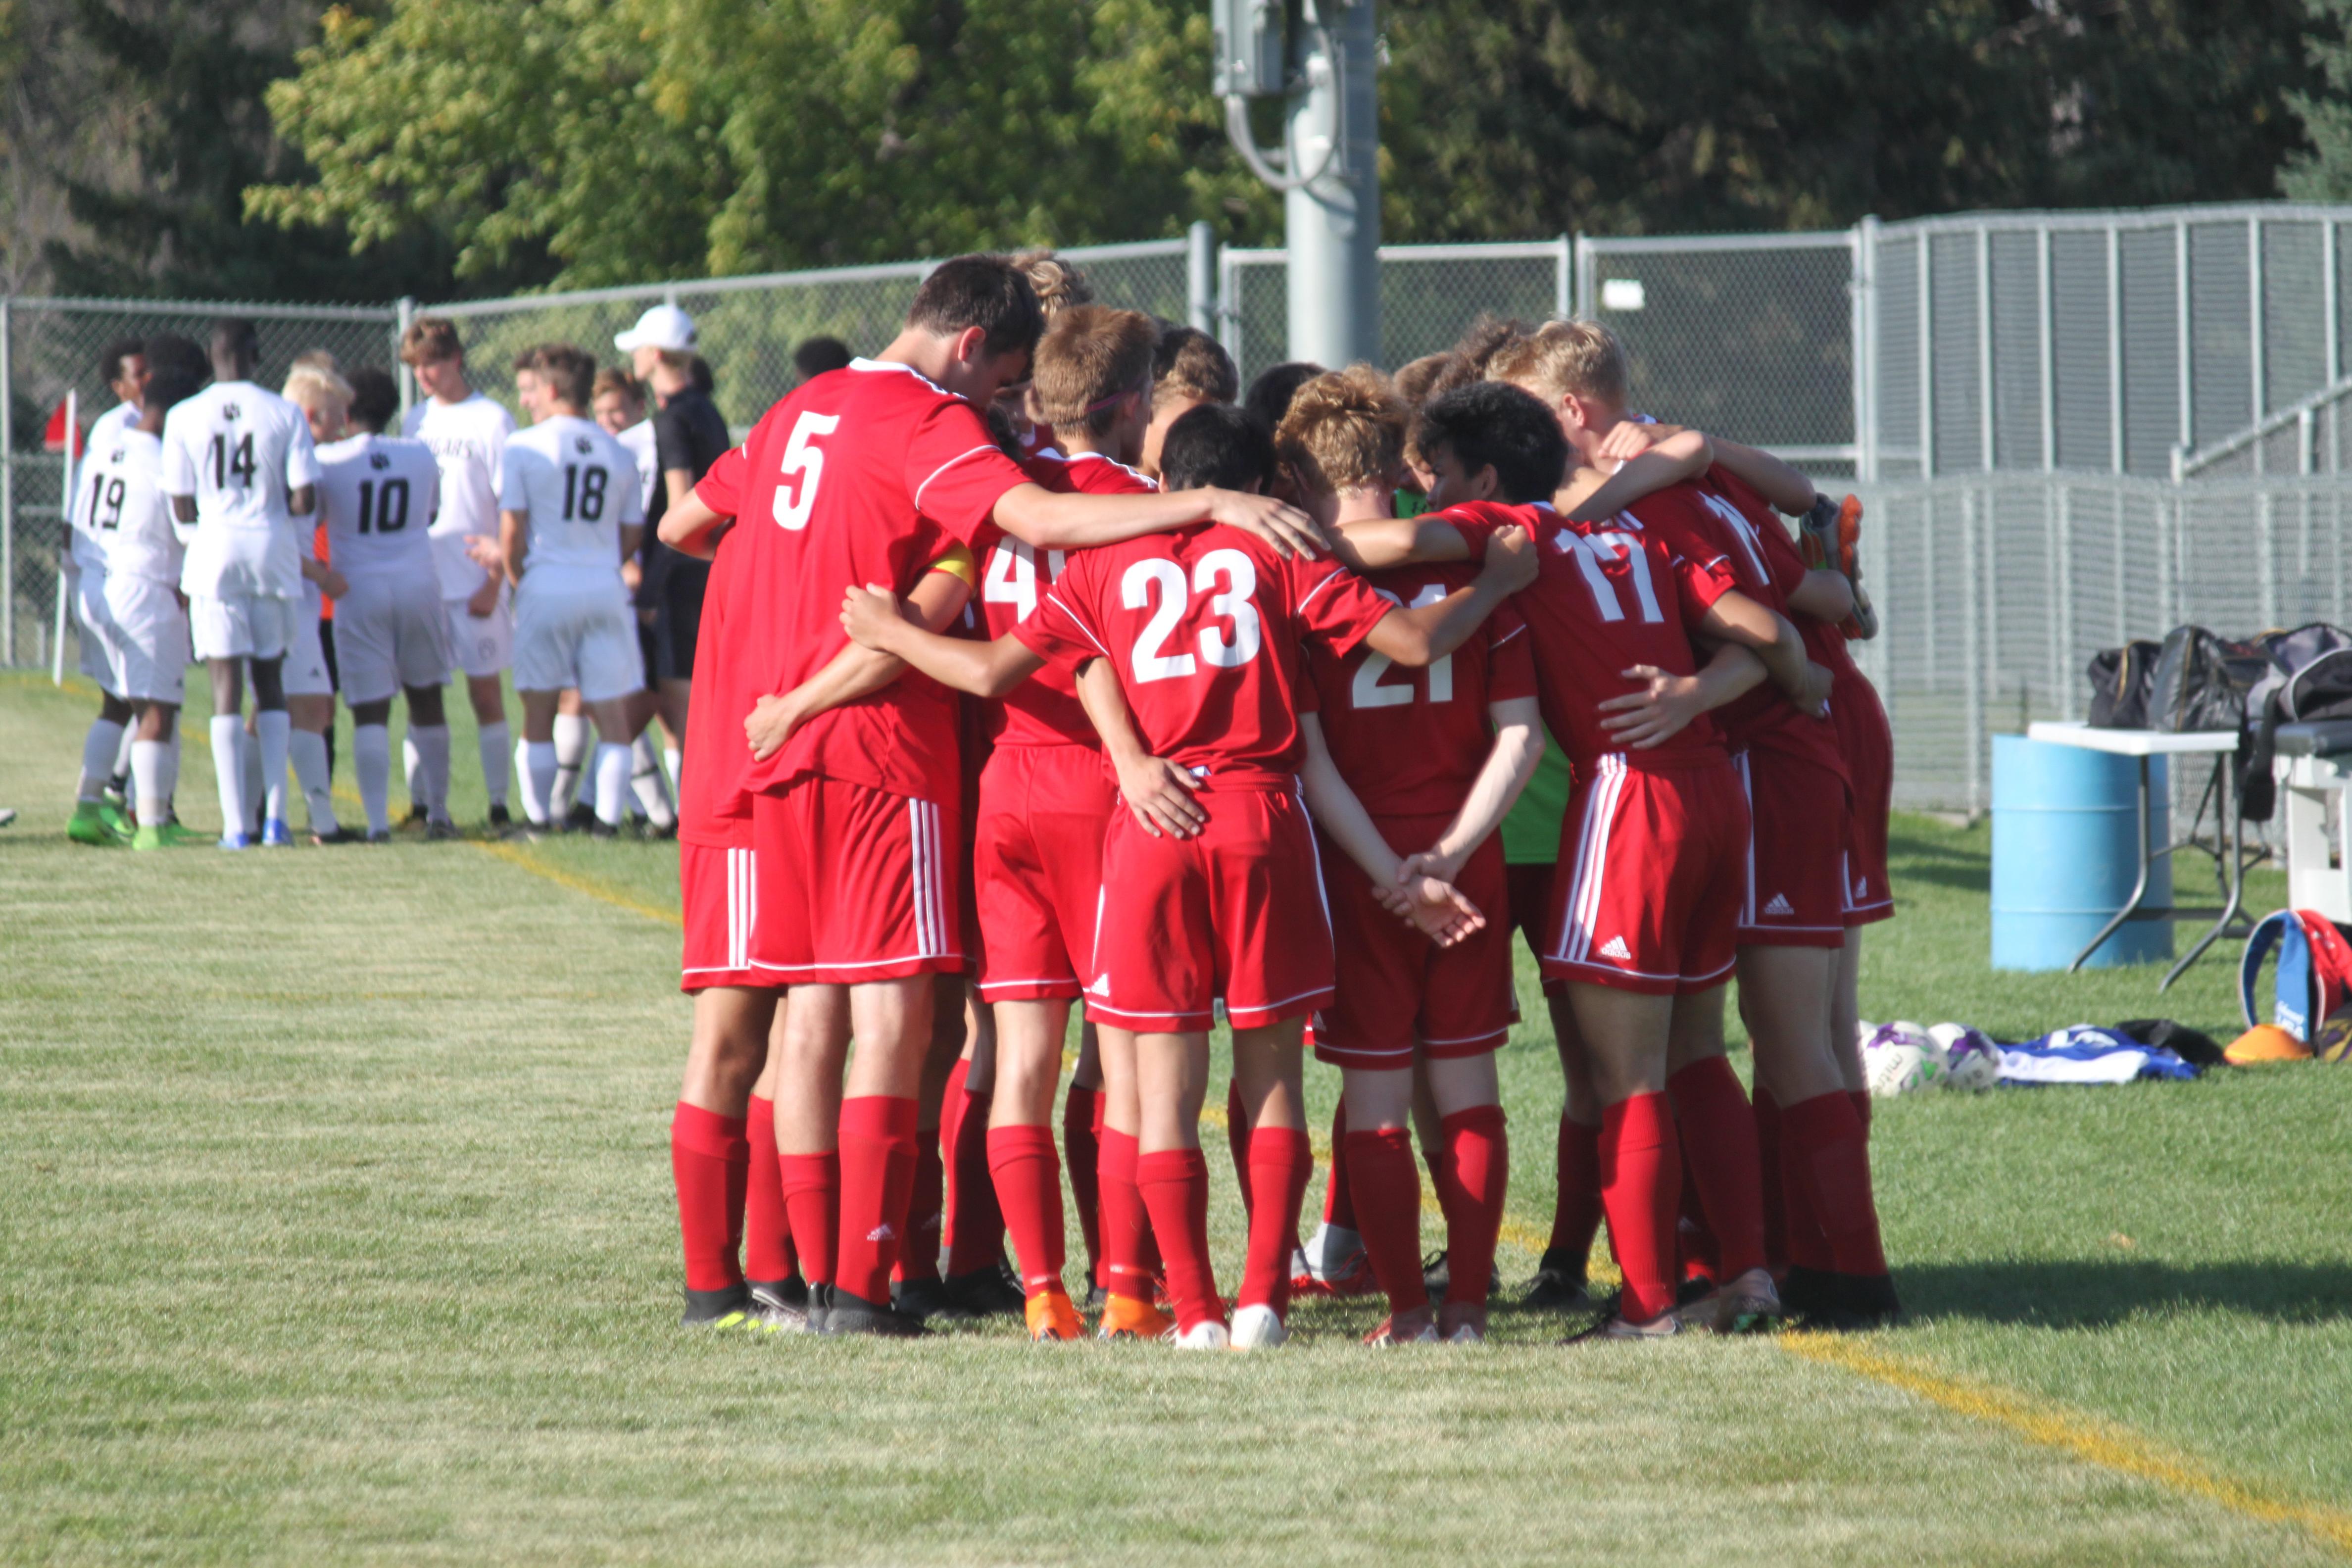 bde9df6e456b Mound Westonka Boys Varsity Soccer - Team Home Mound Westonka White ...